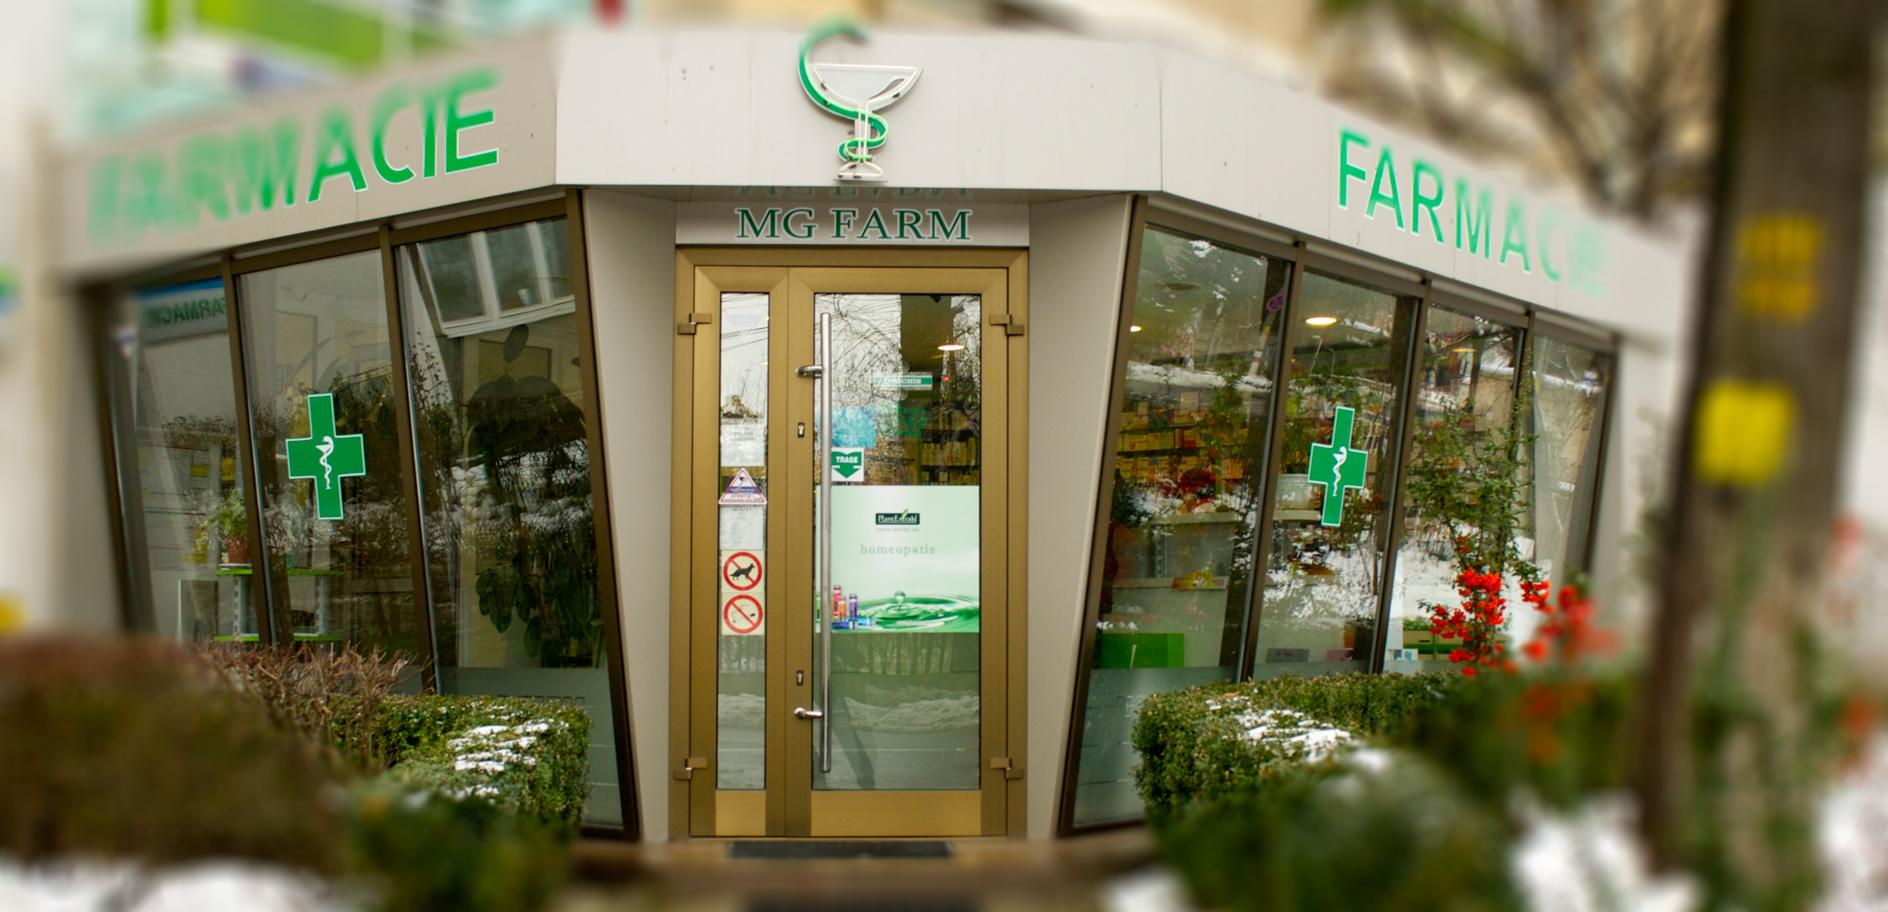 mg-farm-bacau-homeopatie